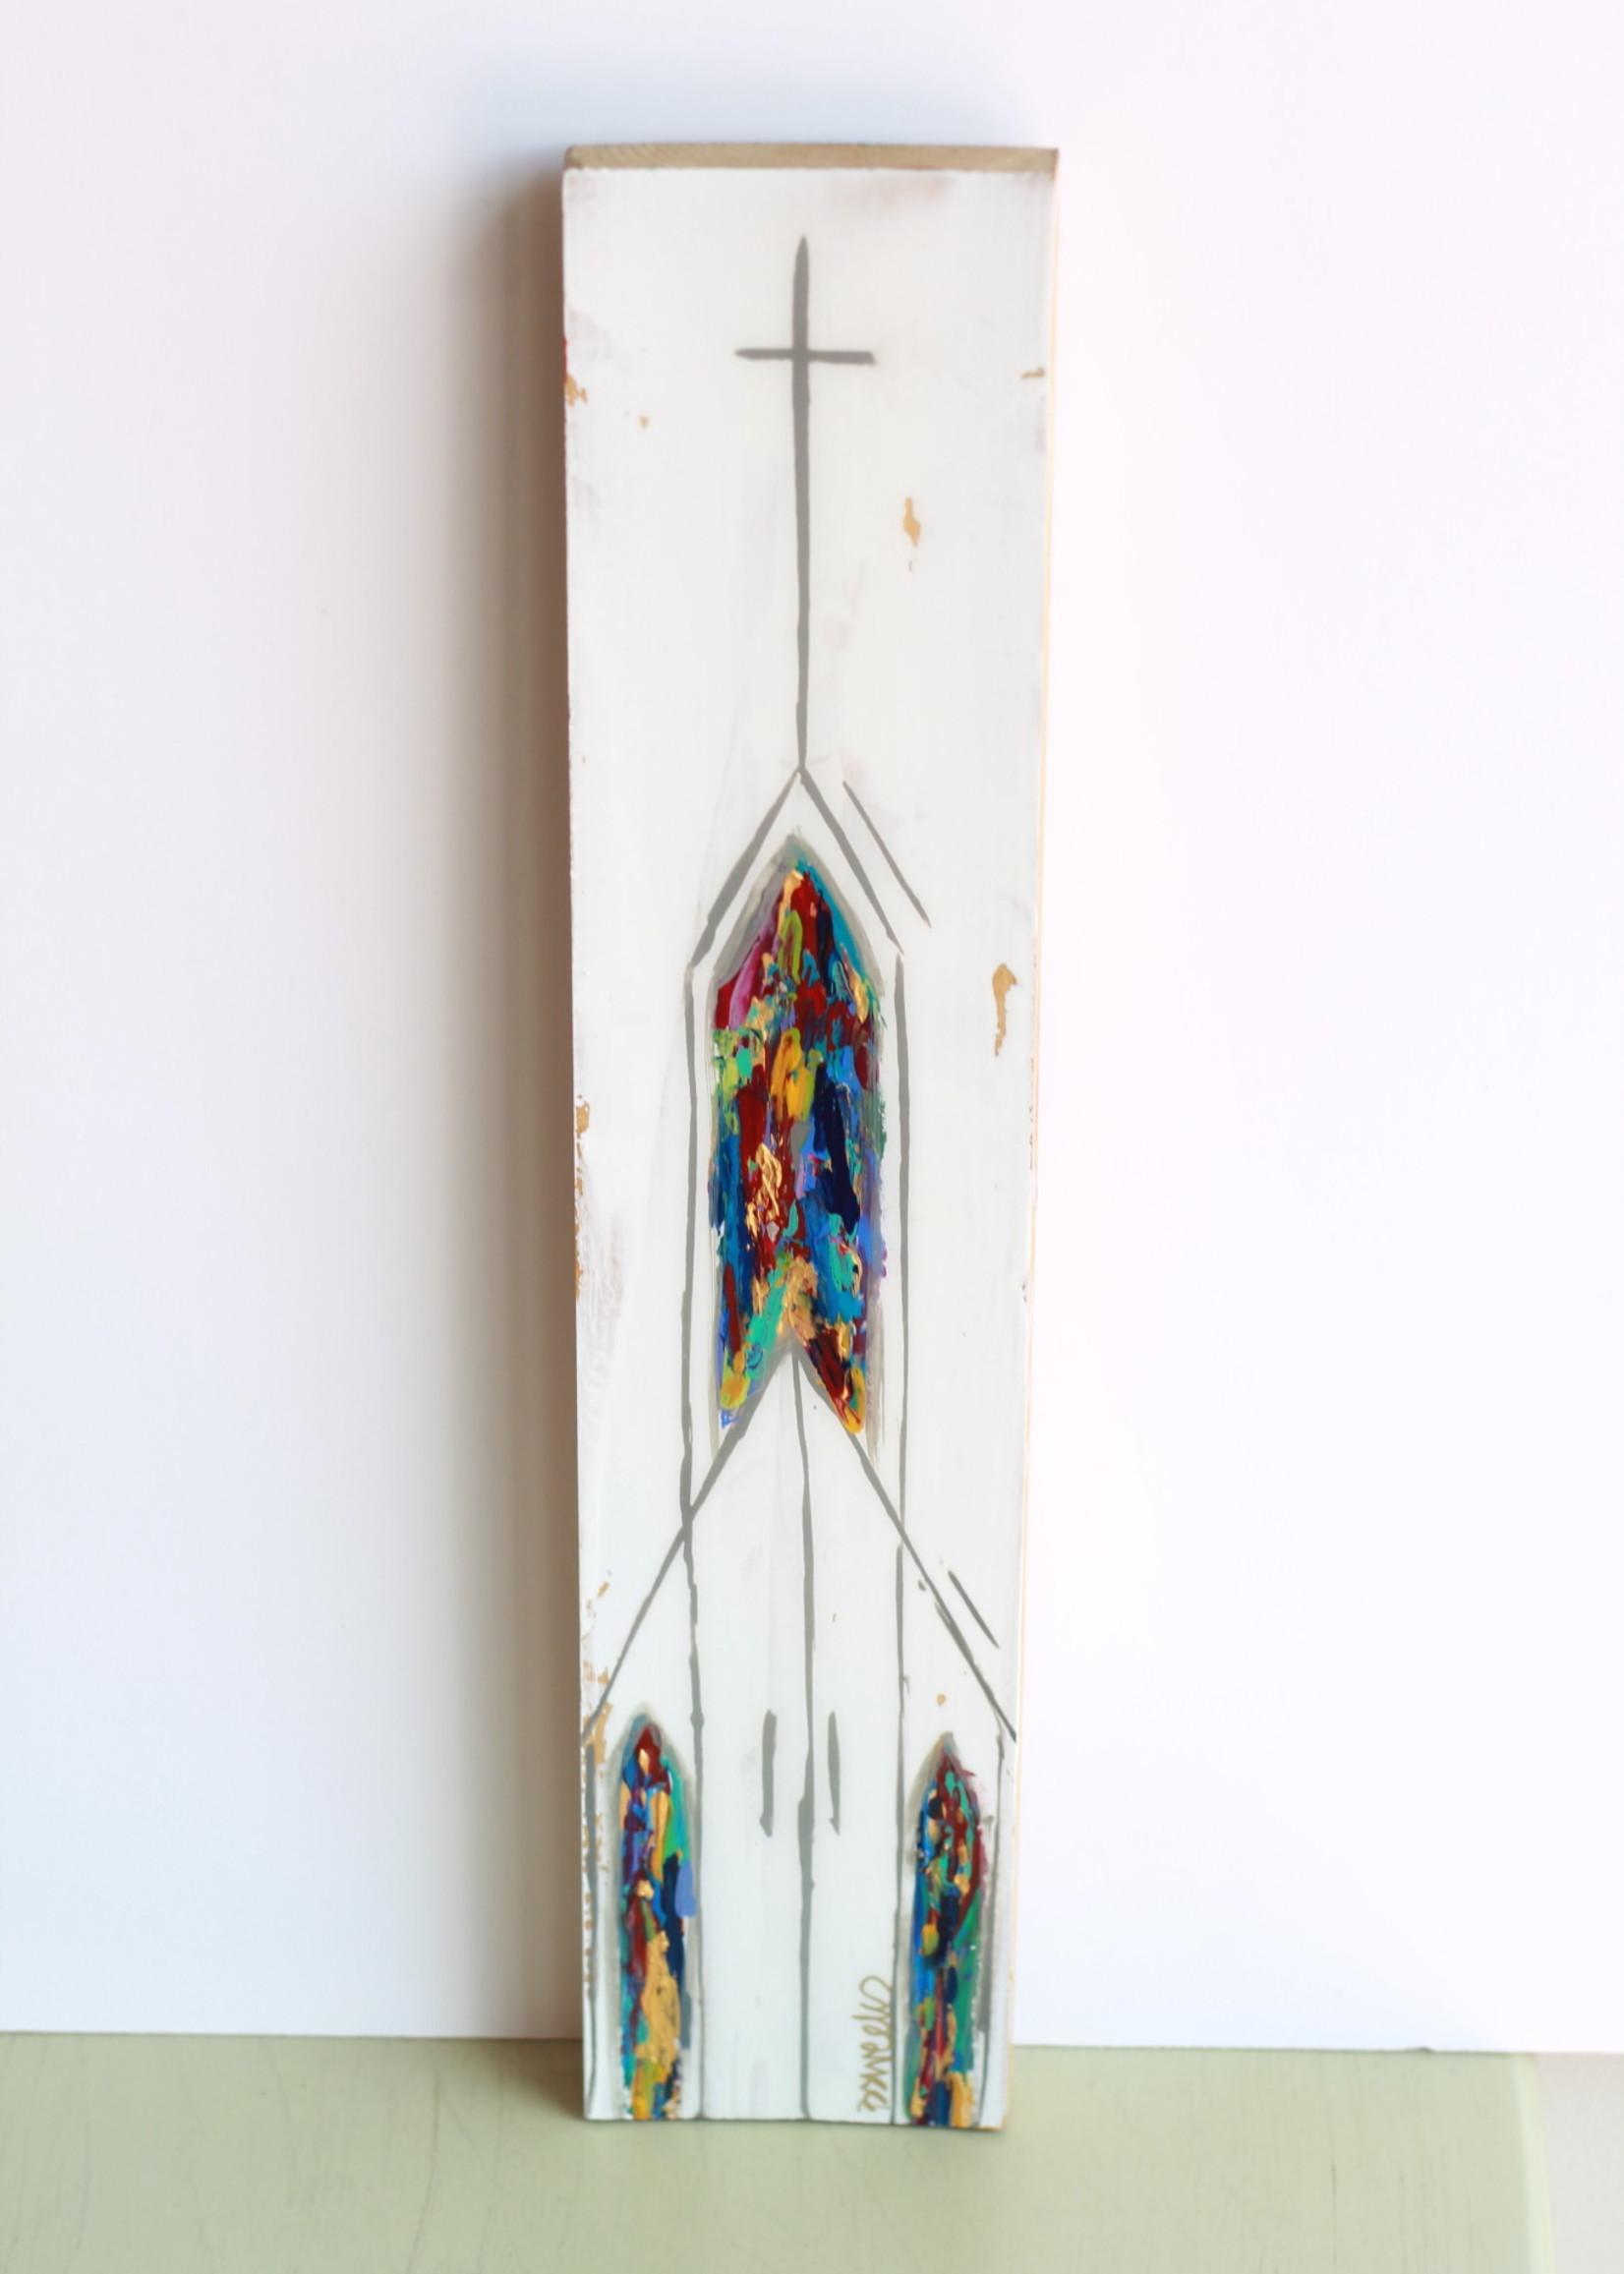 BJ Weeks BJ Weeks Churches on Wood I 4x16